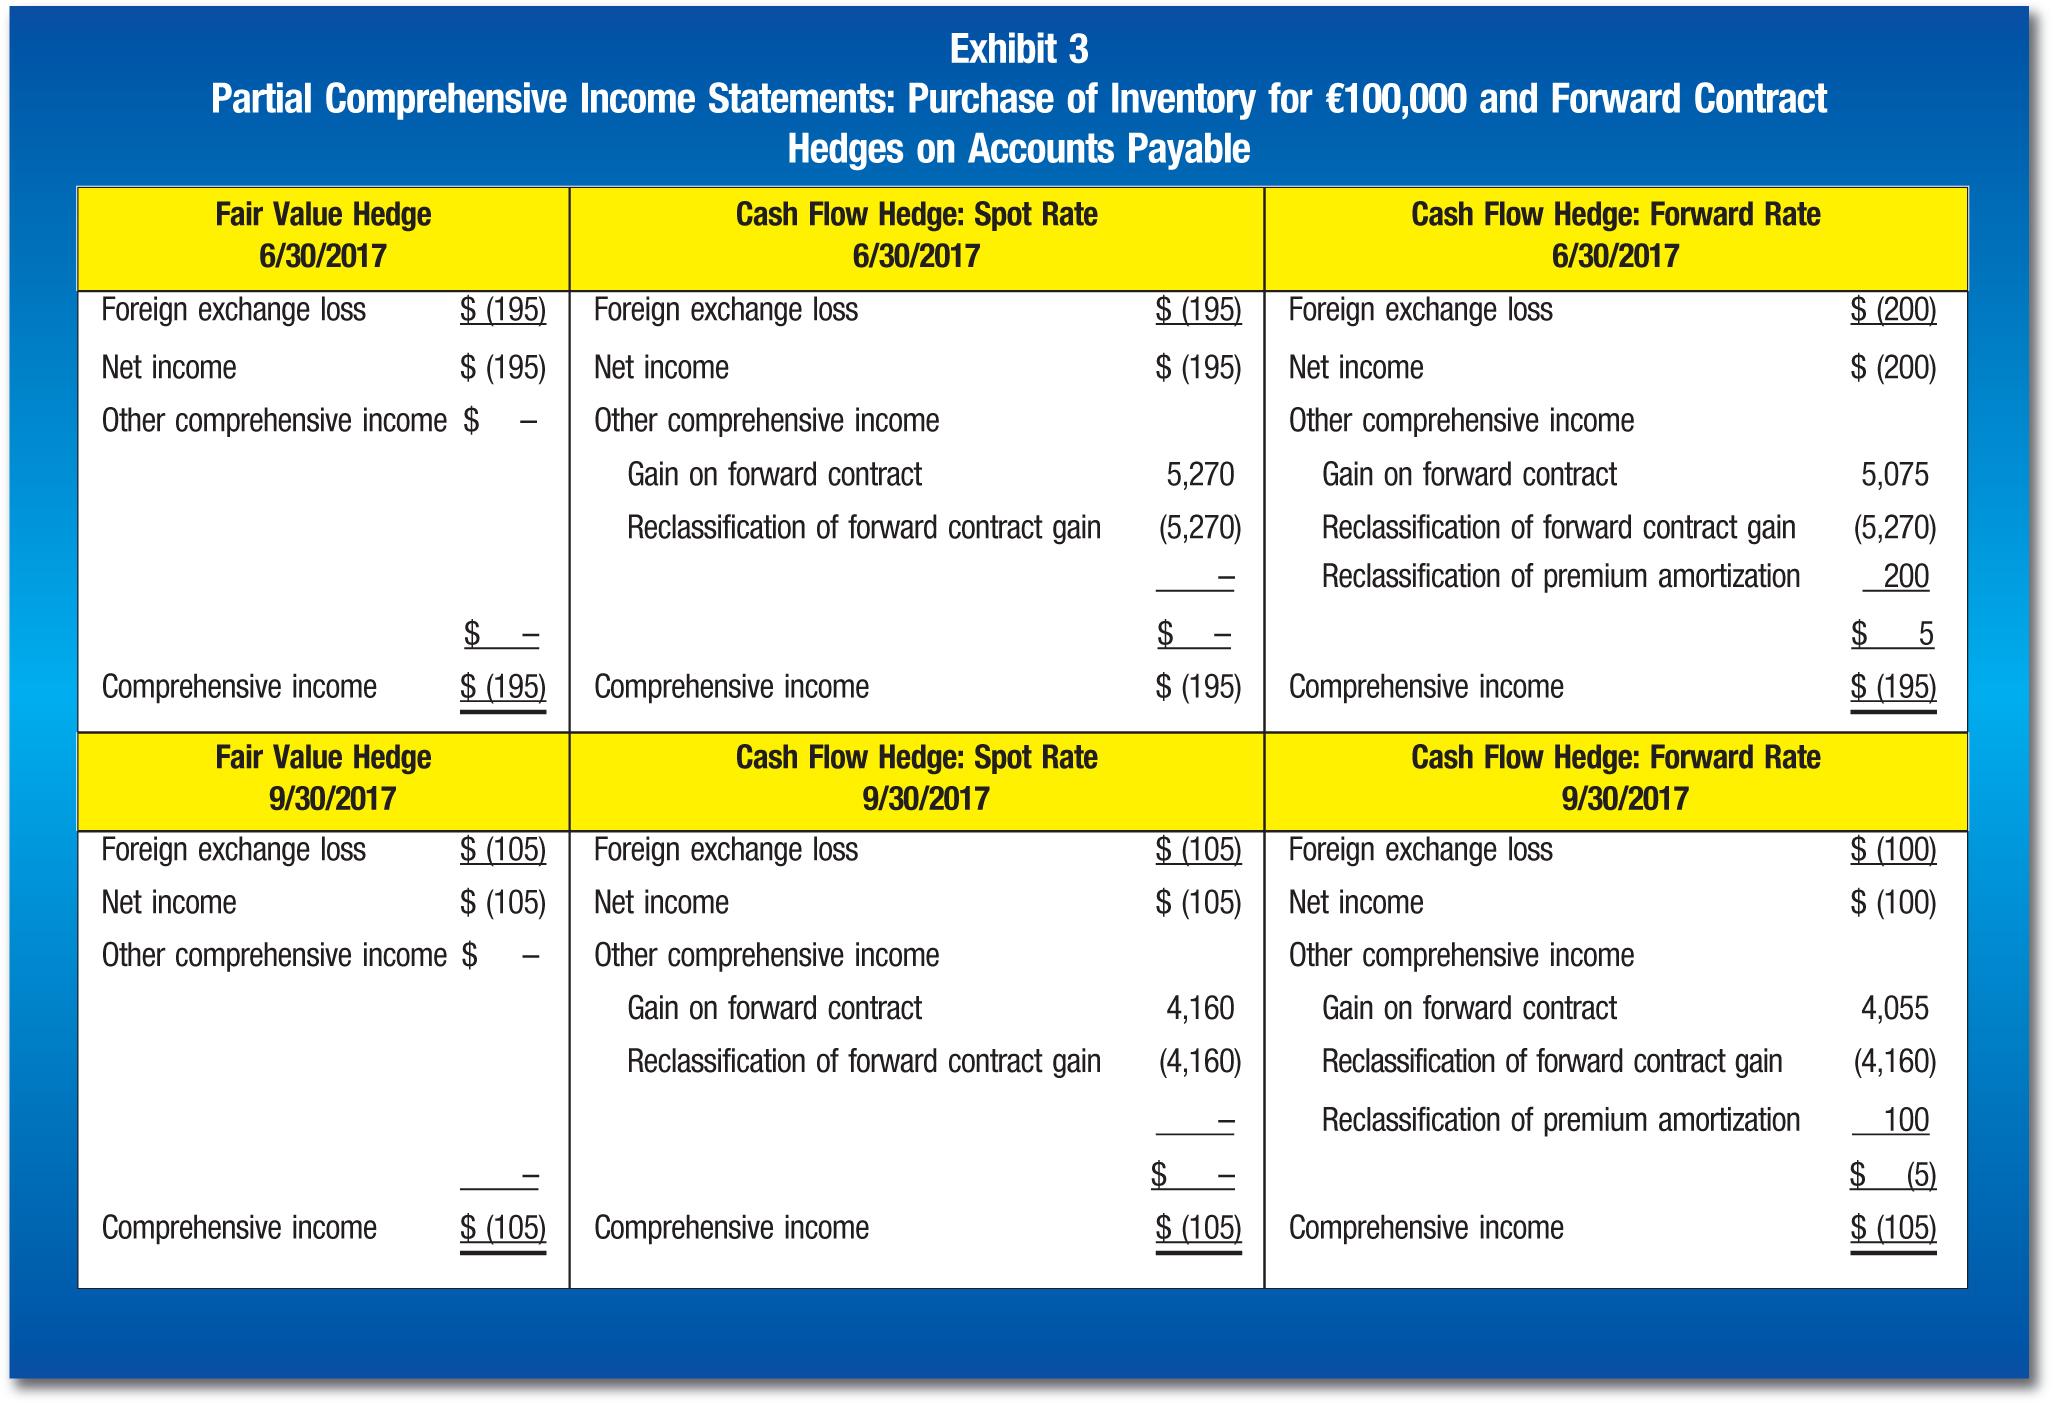 Fair Value Hedge 6/30/2017; Cash Flow Hedge: Spot Rate 6/30/2017; Cash Flow Hedge: Forward Rate 6/30/2017 Foreign exchange loss; $ (195); Foreign exchange loss; $ (195); Foreign exchange loss; $ (200) Net income; $ (195); Net income; $ (195); Net income; $ (200) Other comprehensive income; $ –; Other comprehensive income; Other comprehensive income Gain on forward contract; 5,270; Gain on forward contract; 5,075 Reclassification of forward contract gain; (5,270); Reclassification of forward contract gain; (5,270) –; Reclassification of premium amortization; 200 $ –; $ –; $ 5 Comprehensive income; $ (195); Comprehensive income; $ (195); Comprehensive income; $ (195) Fair Value Hedge 9/30/2017; Cash Flow Hedge: Spot Rate 9/30/2017; Cash Flow Hedge: Forward Rate 9/30/2017 Foreign exchange loss; $ (105); Foreign exchange loss; $ (105); Foreign exchange loss $ (100) Net income; $ (105); Net income; $ (105); Net income; $ (100) Other comprehensive income; $ –; Other comprehensive income; Other comprehensive income Gain on forward contract; 4,160; Gain on forward contract; 4,055 Reclassification of forward contract gain; (4,160); Reclassification of forward contract gain; (4,160) –; Reclassification of premium amortization; 100 –; $ –; $ (5) Comprehensive income; $ (105); Comprehensive income; $ (105); Comprehensive income $ (105)